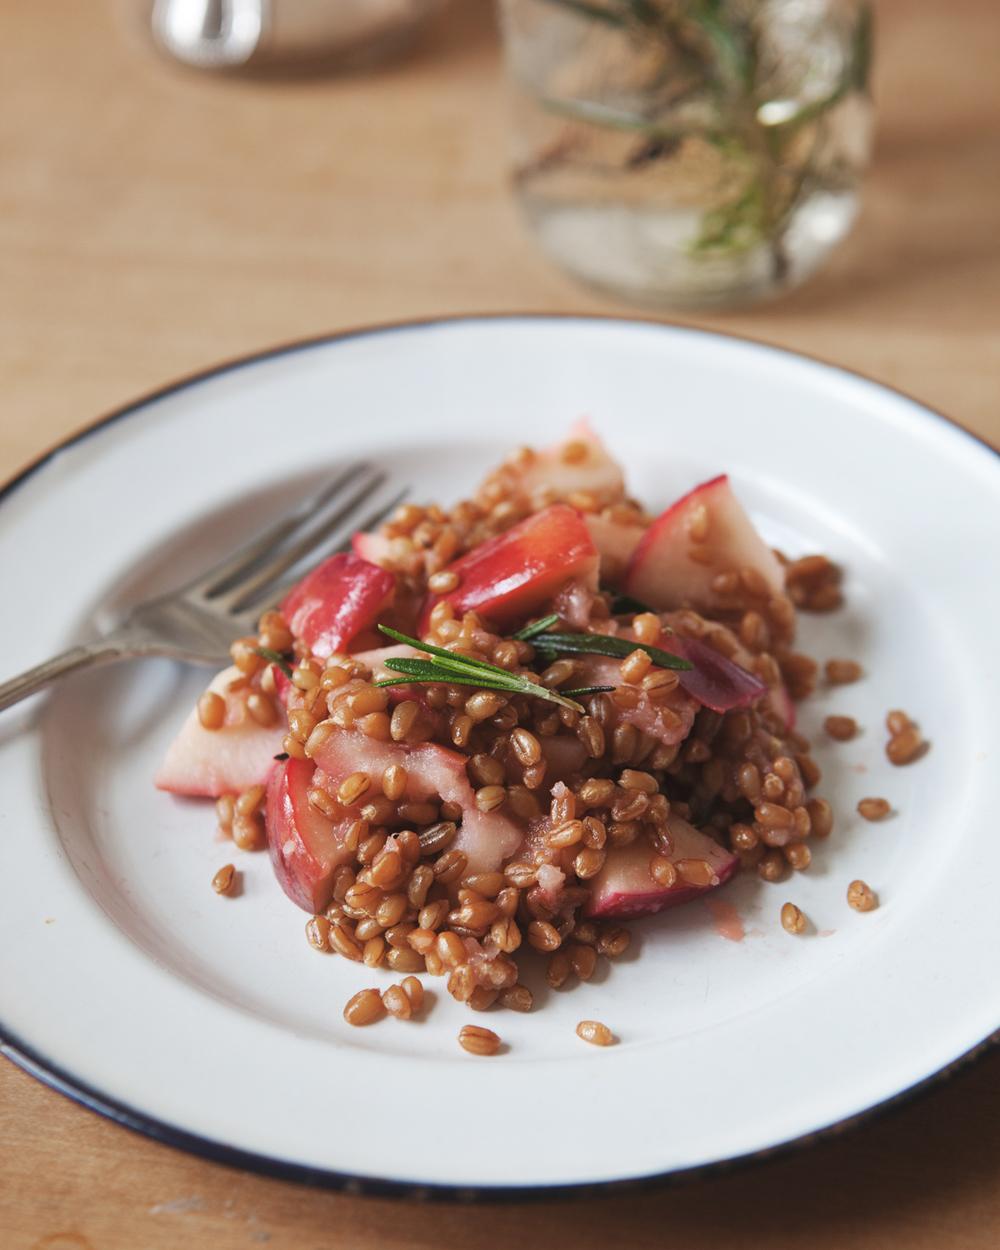 Warm-Rosemary-Apple-Wheatberry-Salad_03.jpg